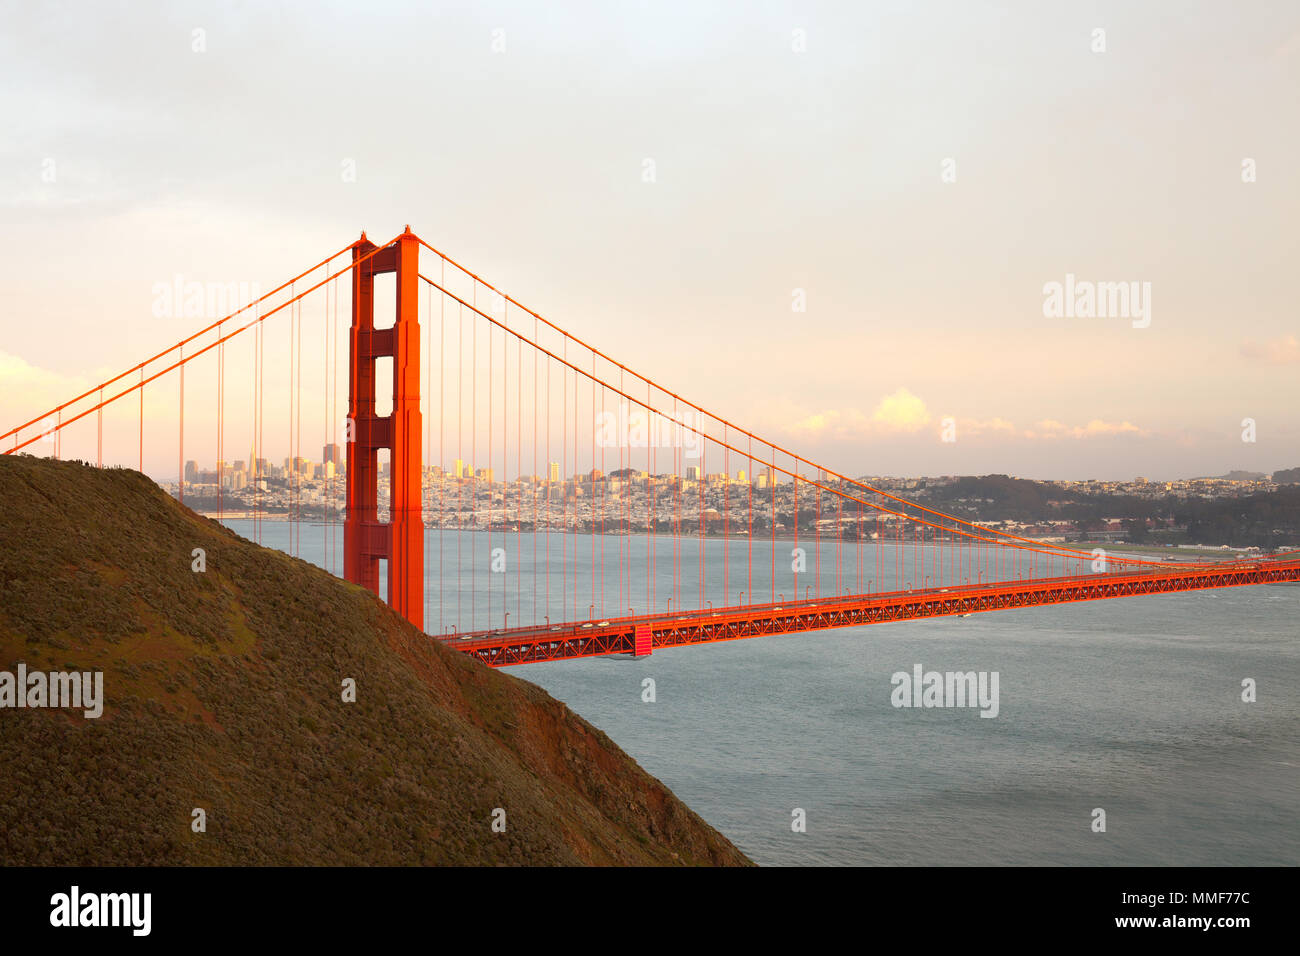 The Golden Gate Bridge in San Francisco, California, USA - Stock Image